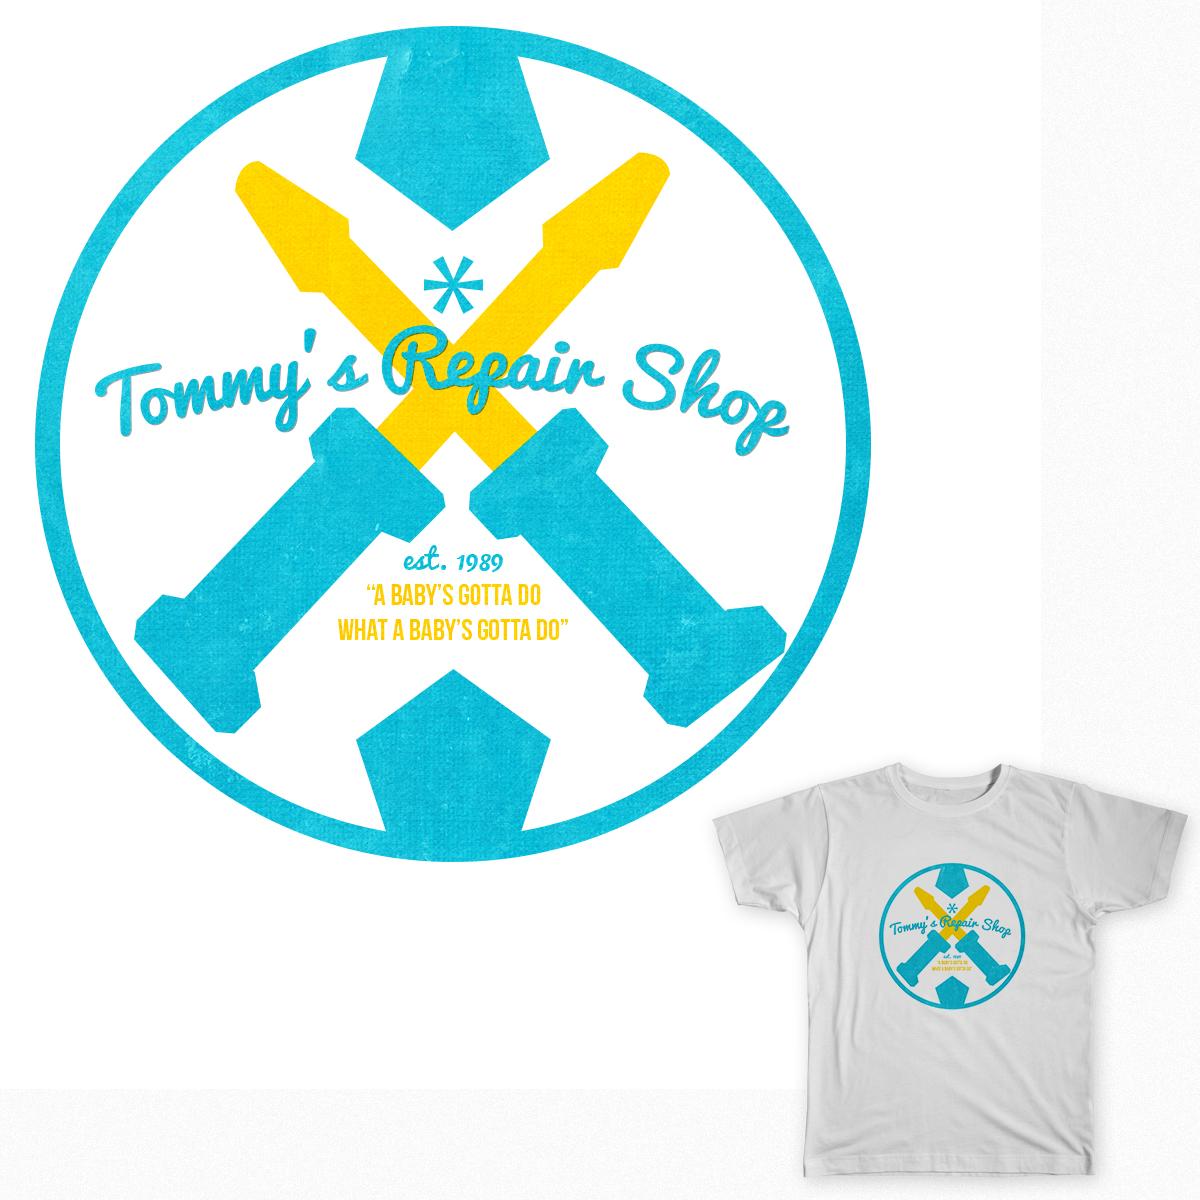 Tommy's Repair Shop by tifftcn on Threadless